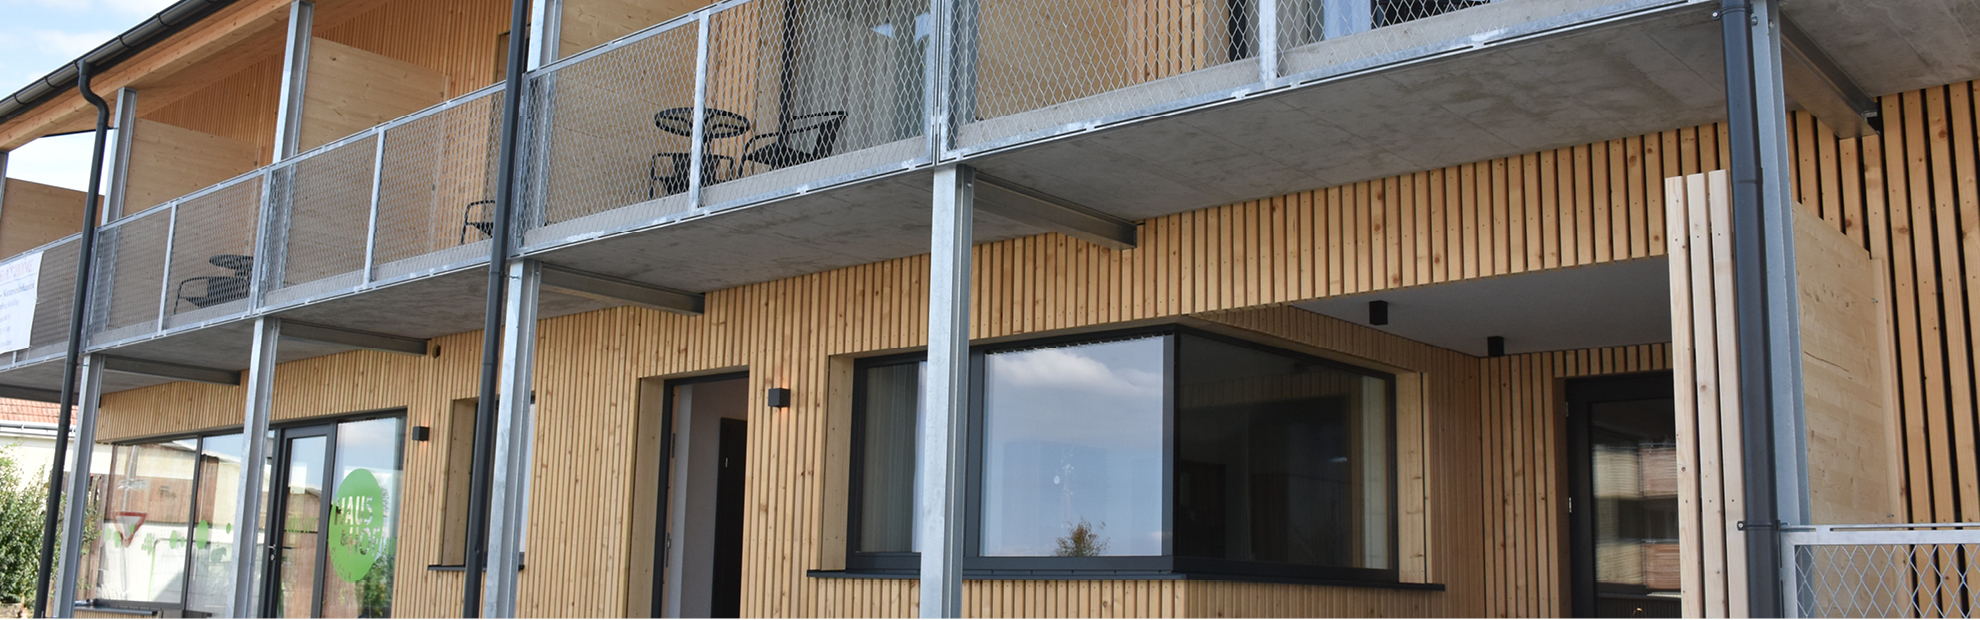 oellerer-website-step3-titelbild-gaestehaus